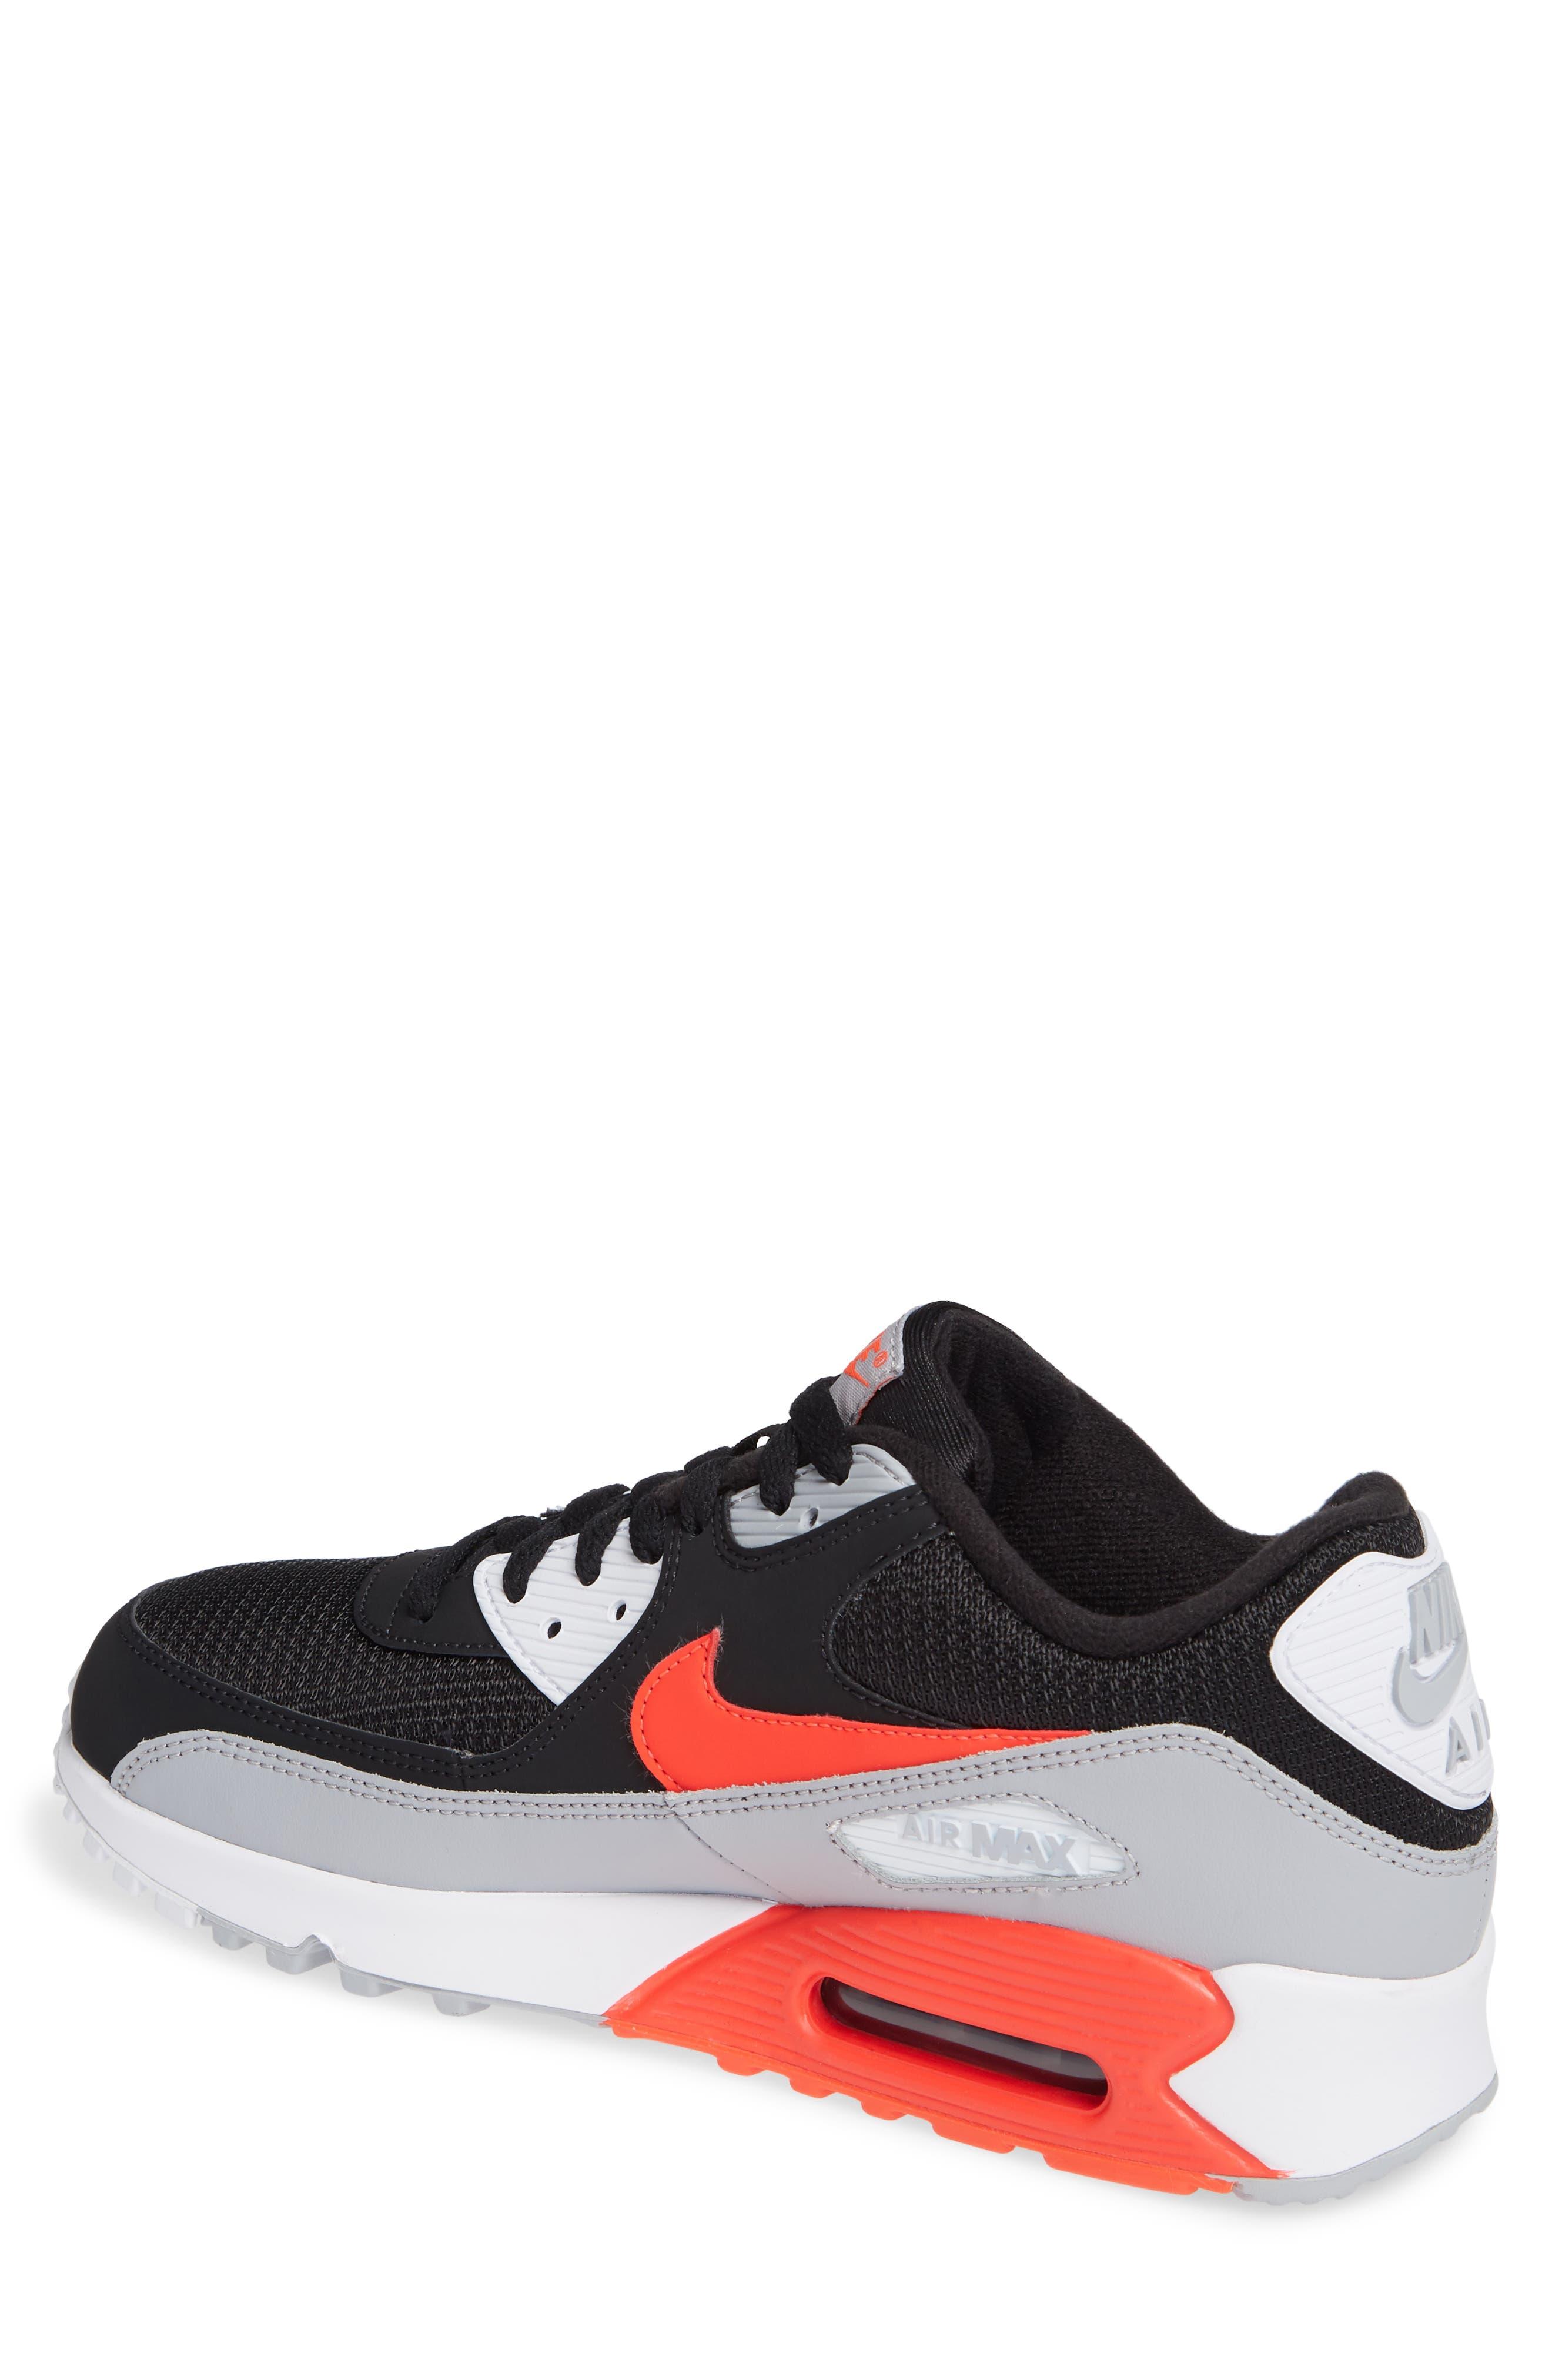 Air Max 90 Essential Sneaker,                             Alternate thumbnail 2, color,                             WOLF GREY/ CRIMSON/ BLACK